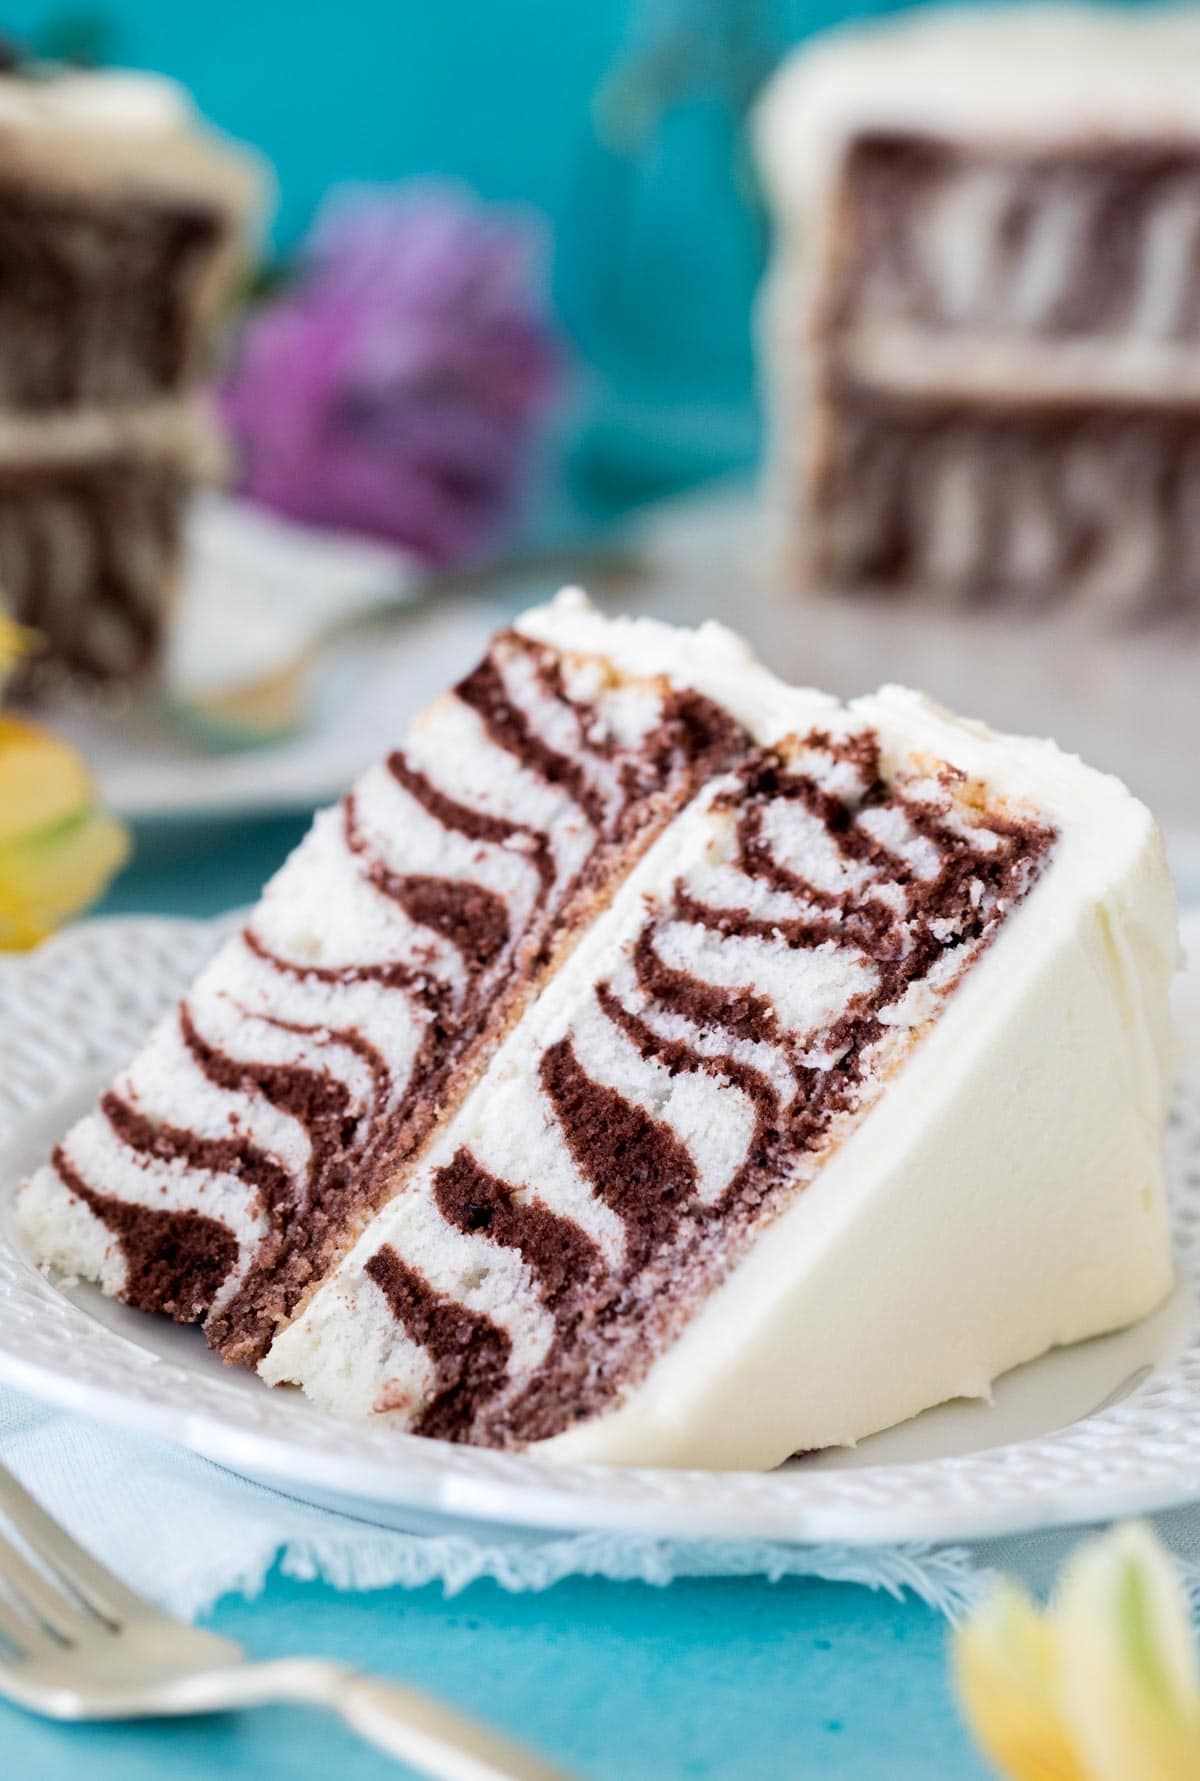 Slice of zebra cake on white plate